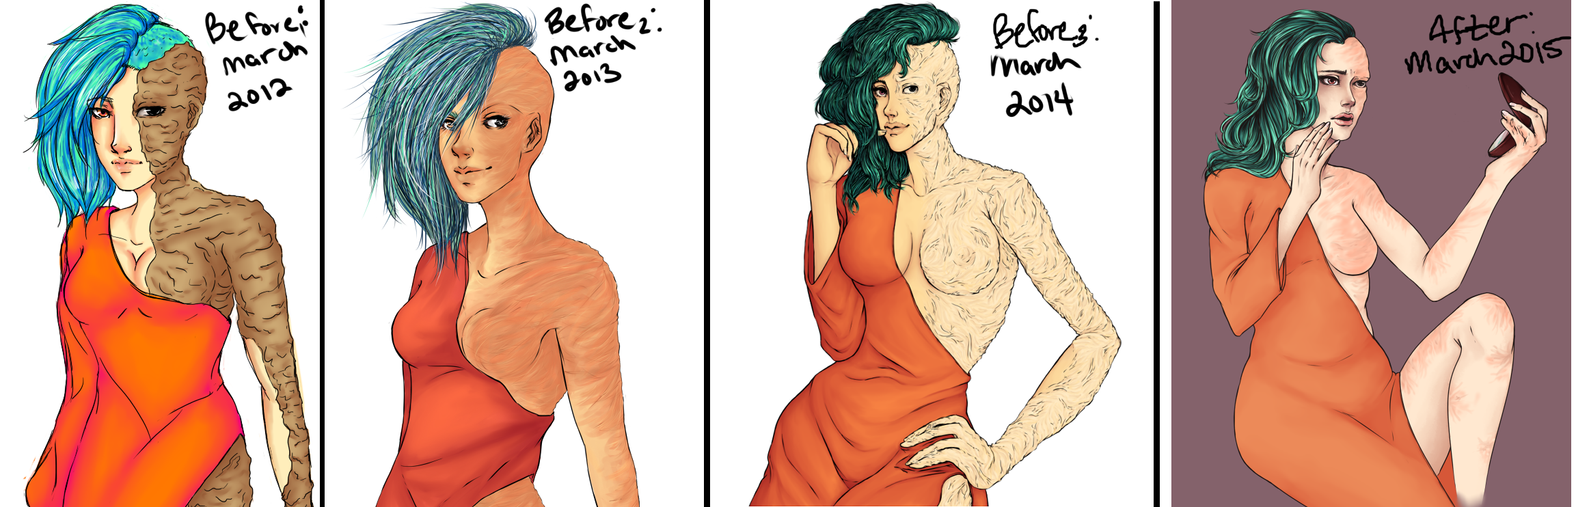 Draw This Again: Amber Mach3 by LippyTappyTooTa